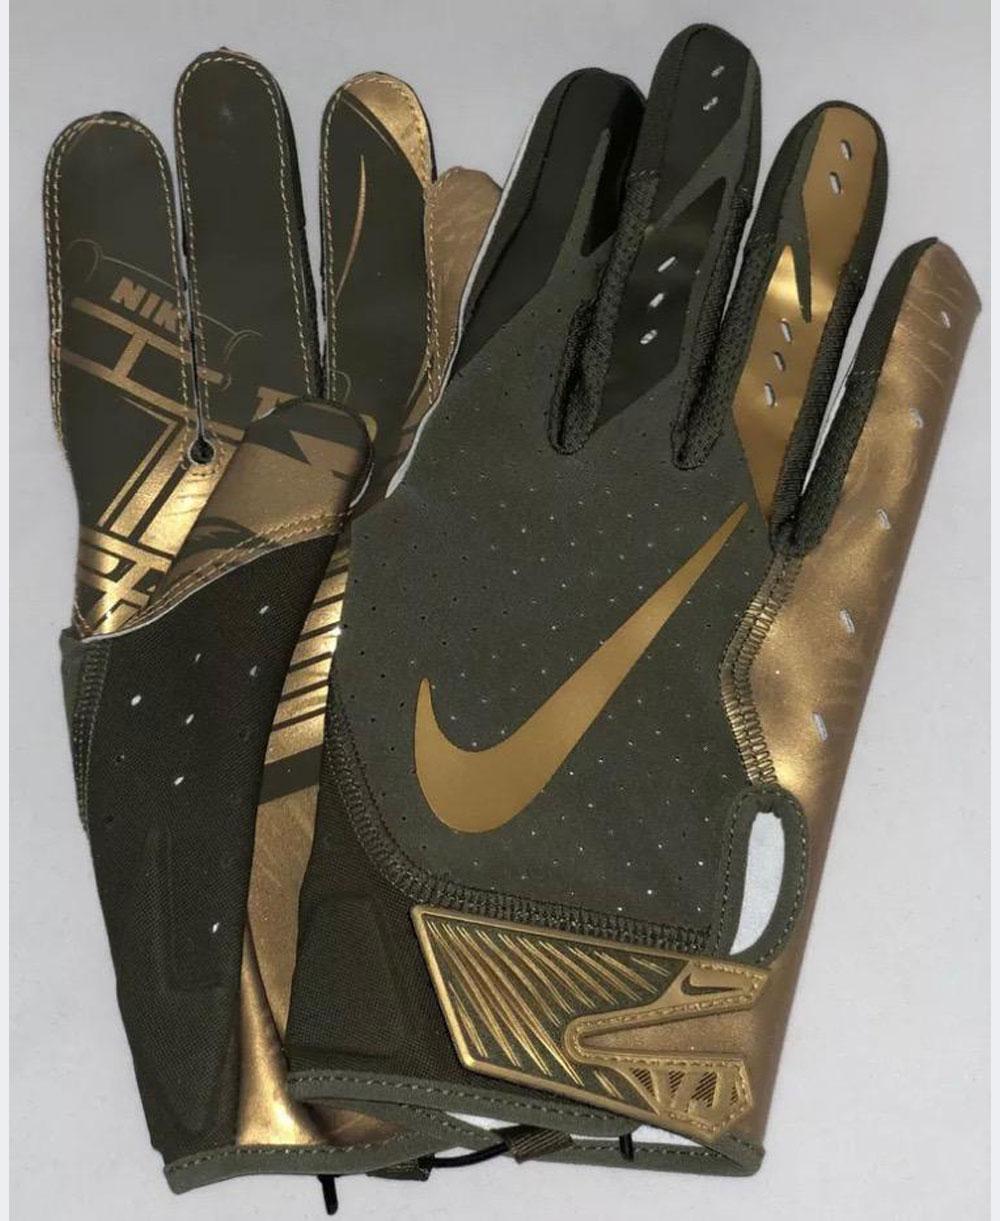 Vapor Jet 5 Guanti Football Americano Uomo Medium Olive/Metallic Gold